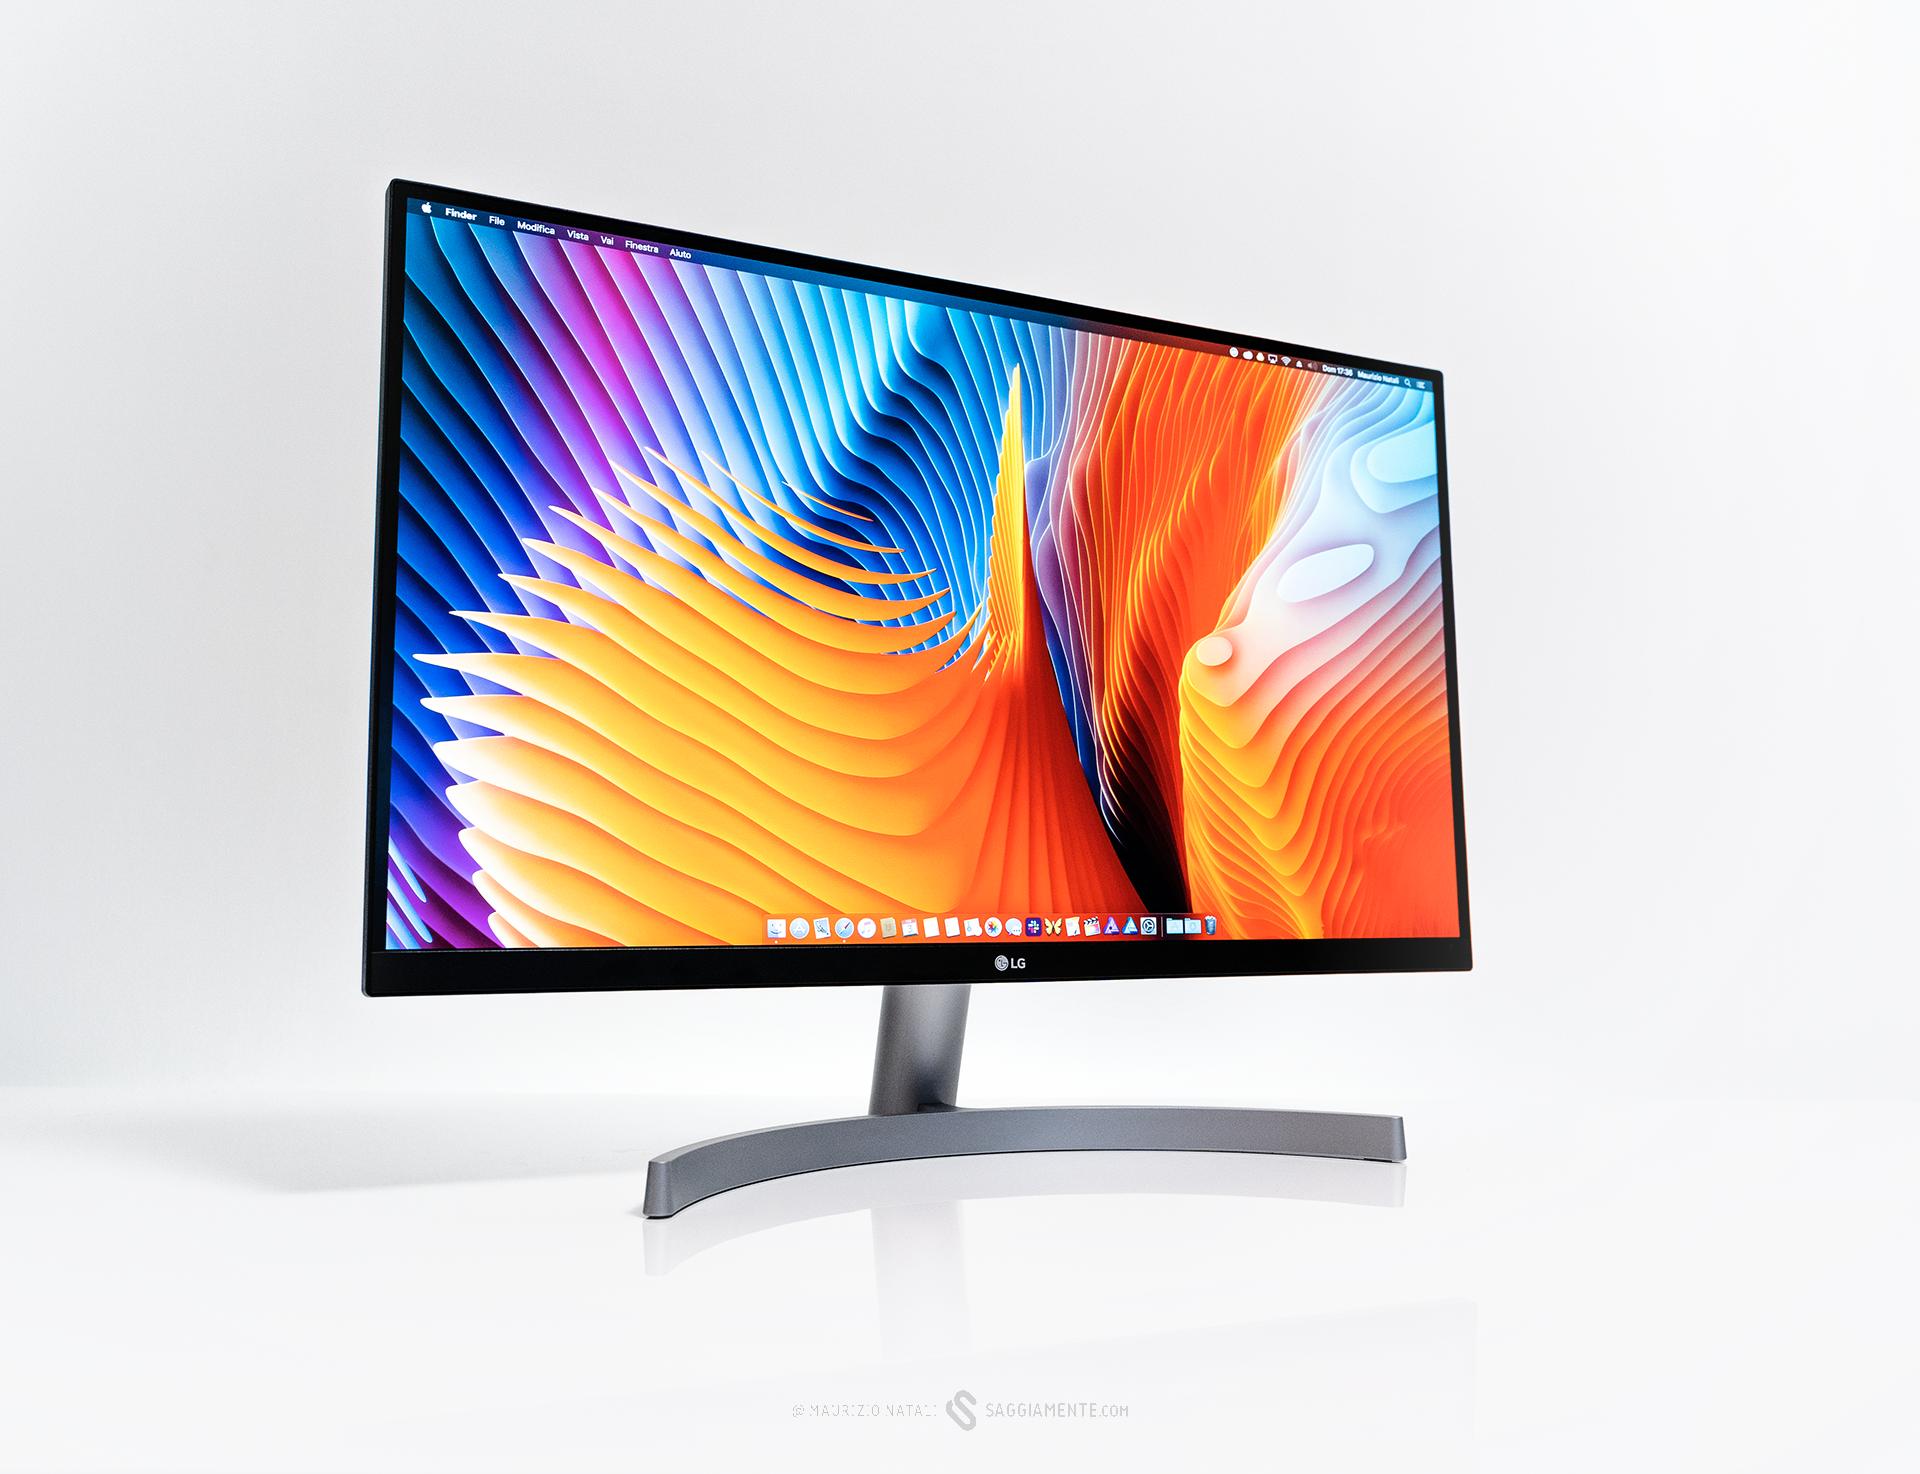 Recensione: LG 27UK600, monitor 27